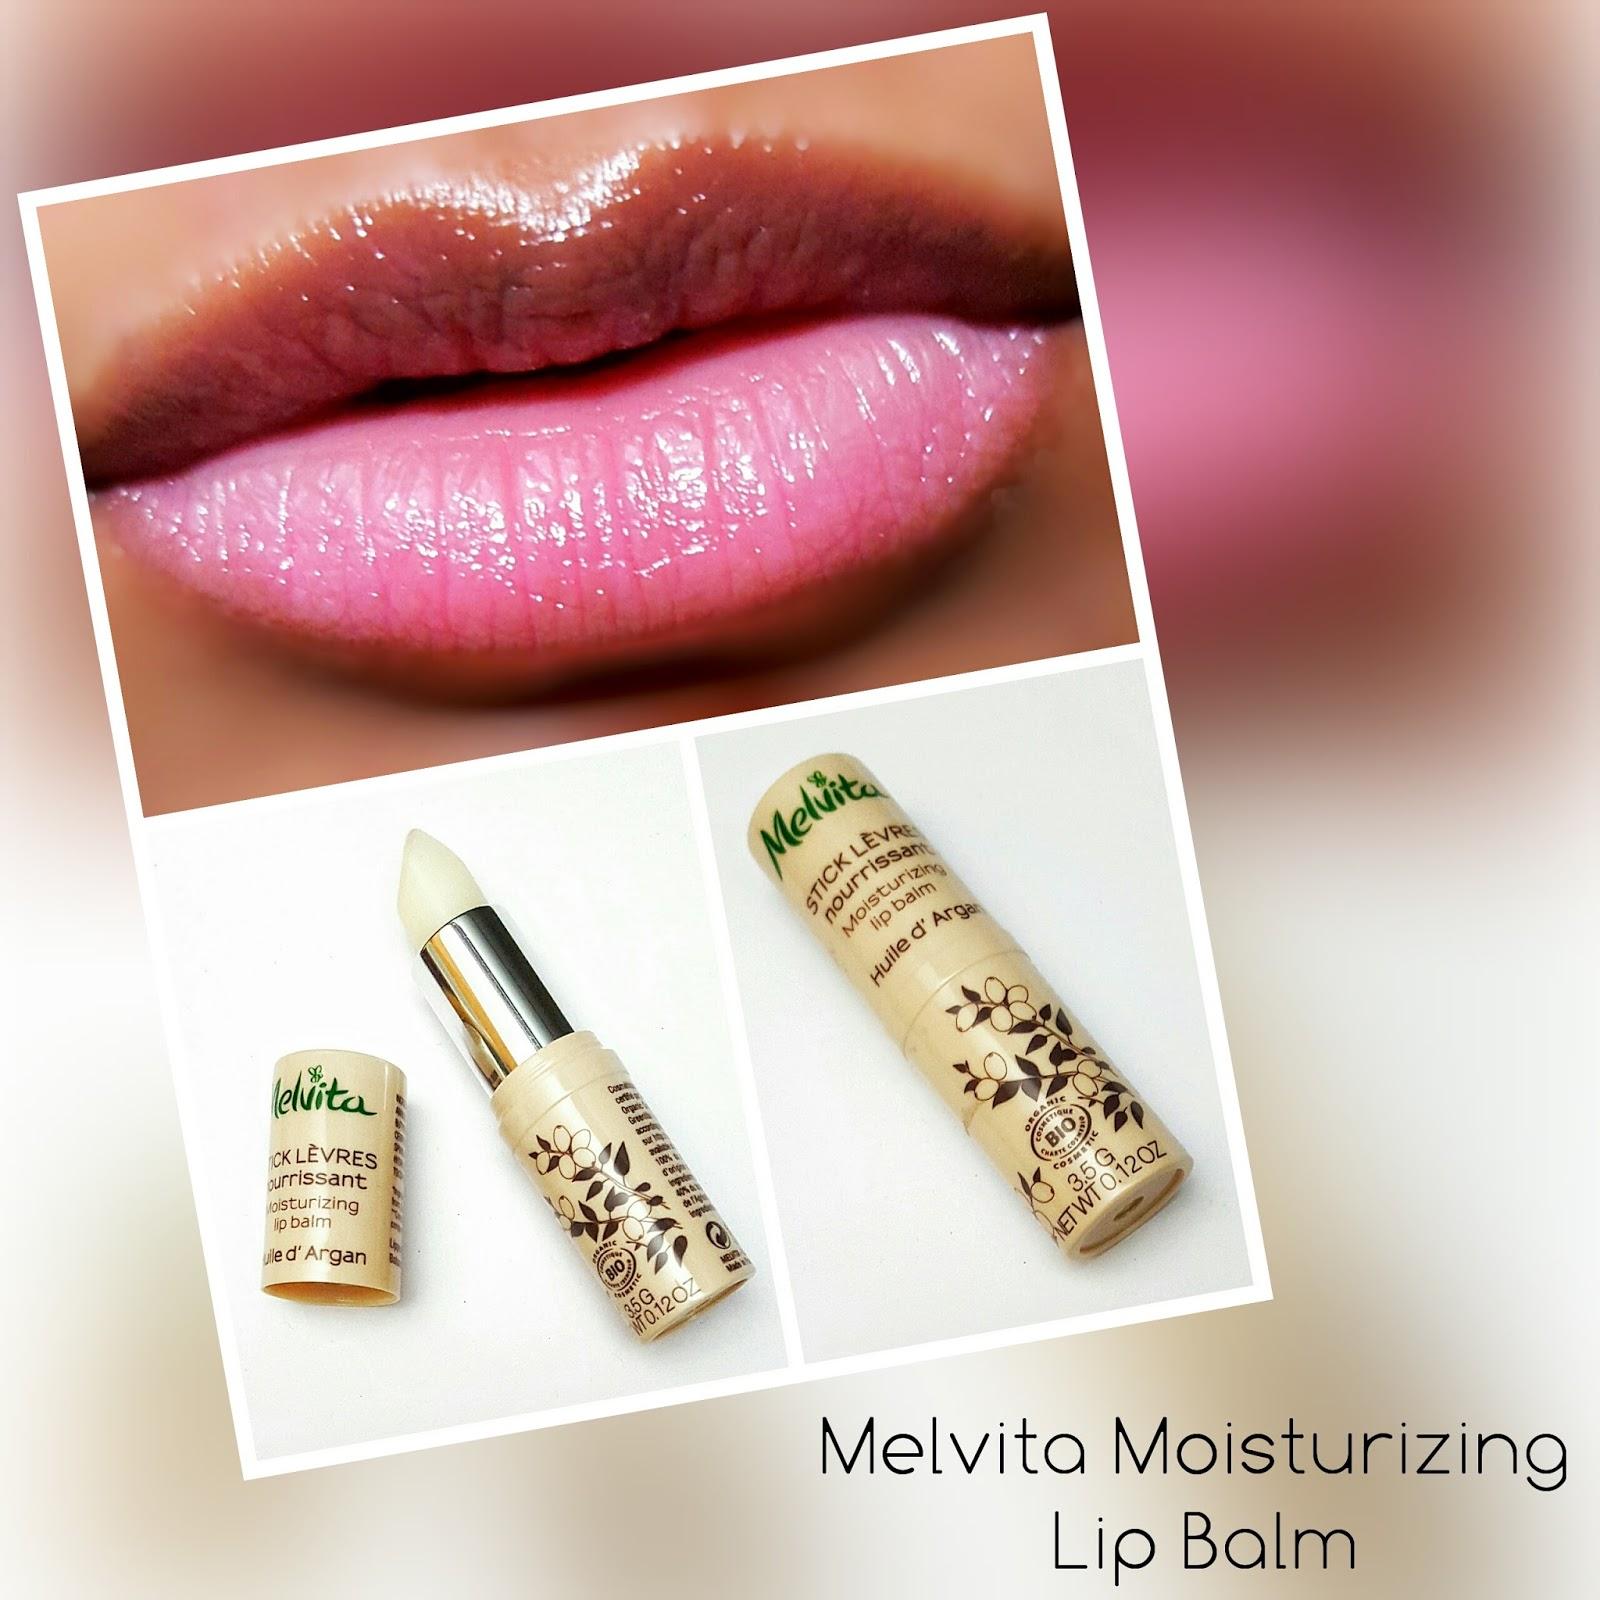 Moisturizing lip balm: reviews 22